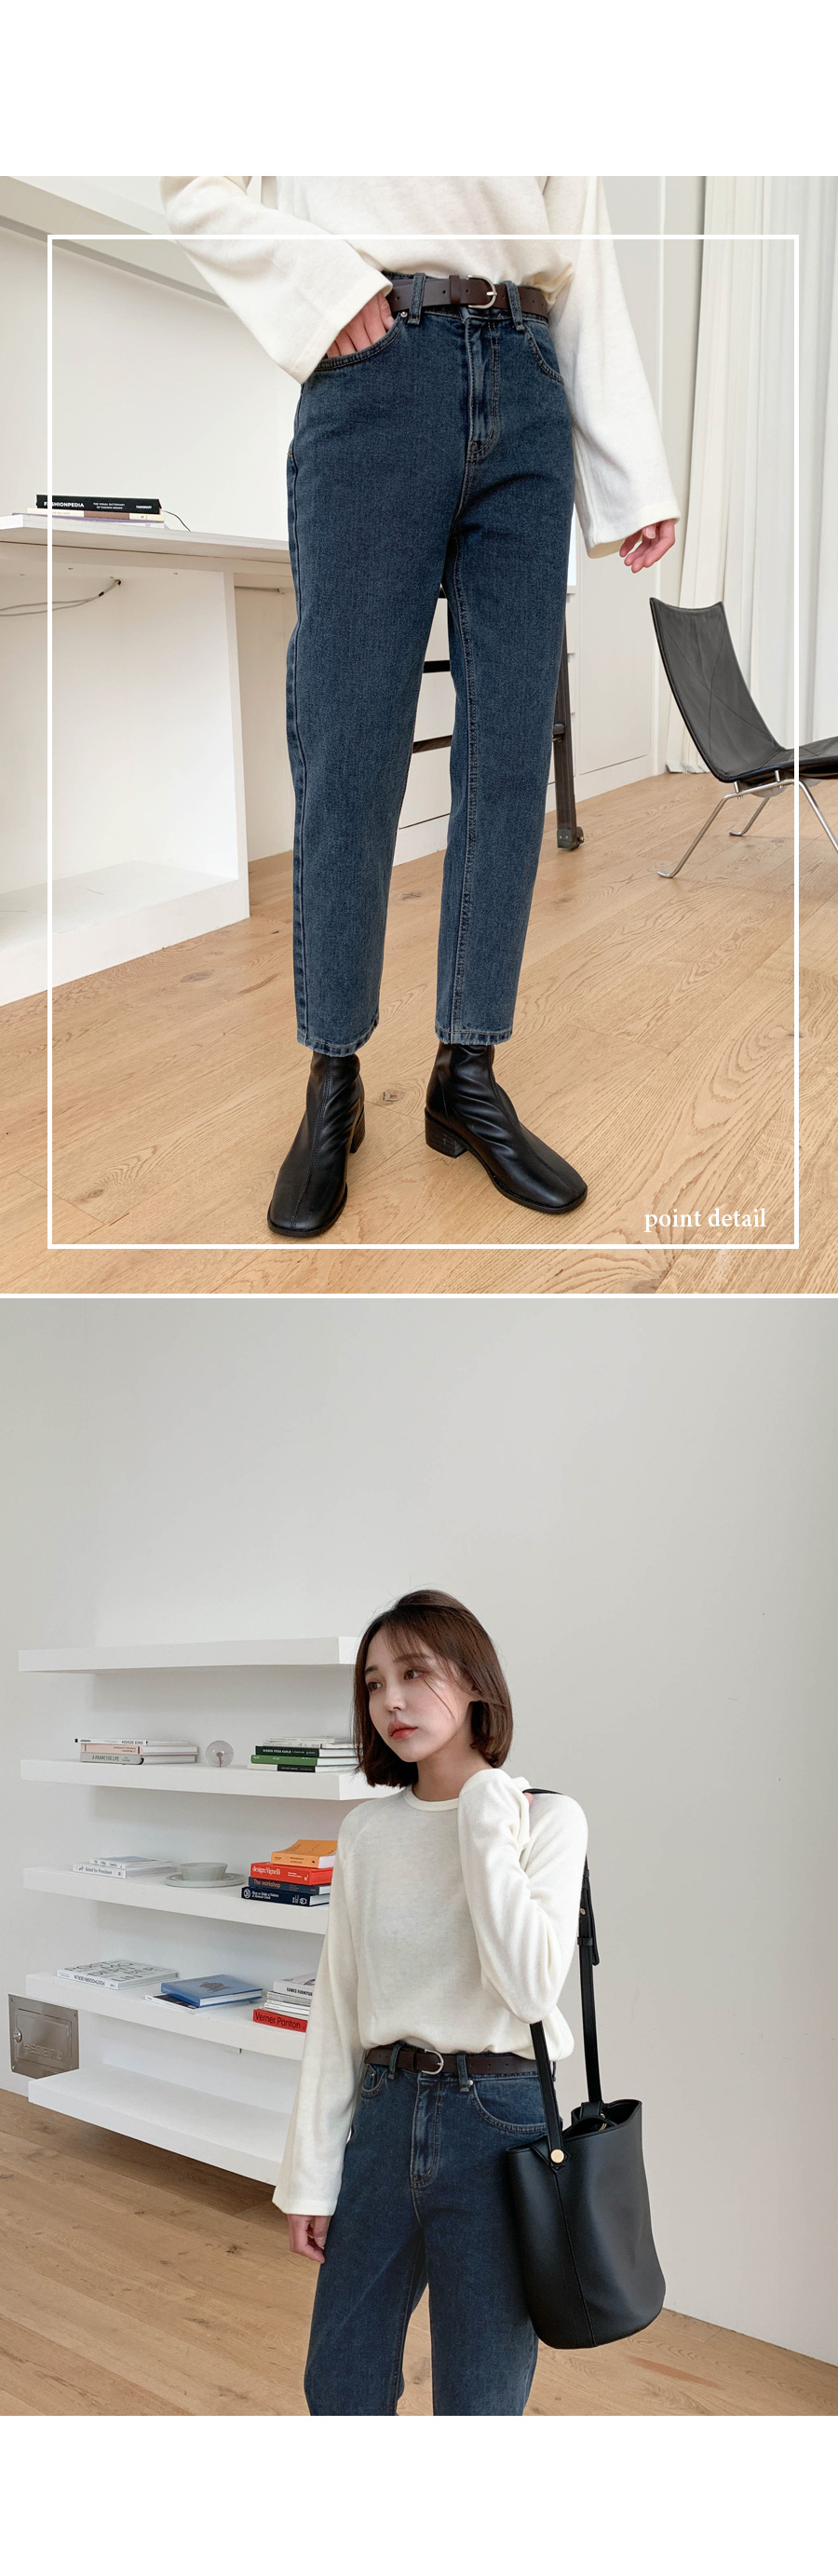 Steady denim pants